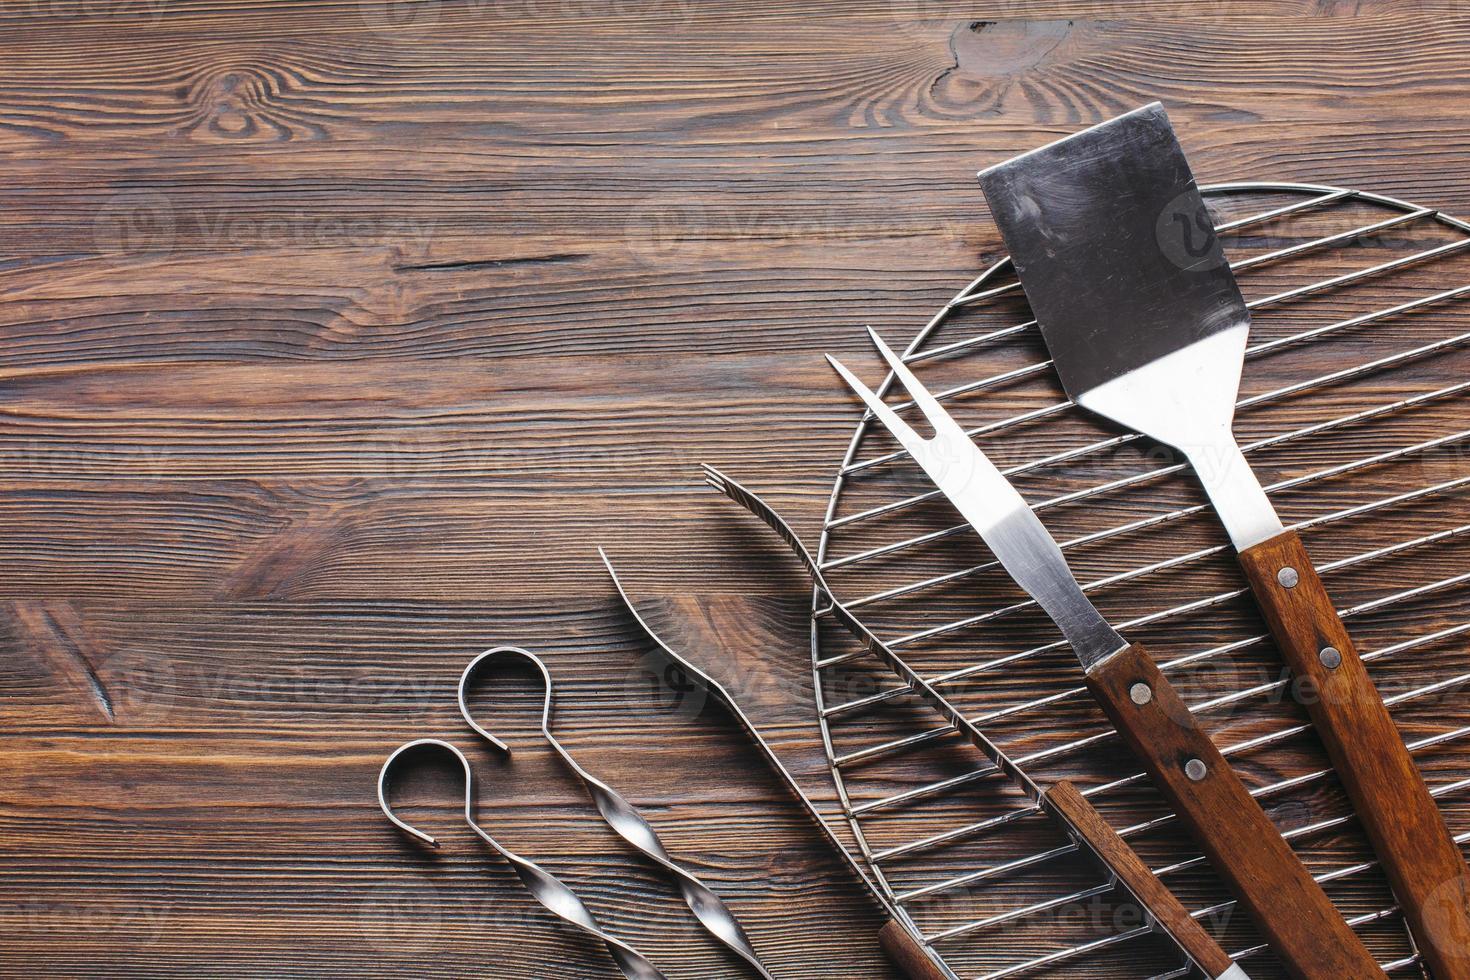 Novos utensílios de churrasco metálico fundo de madeira foto